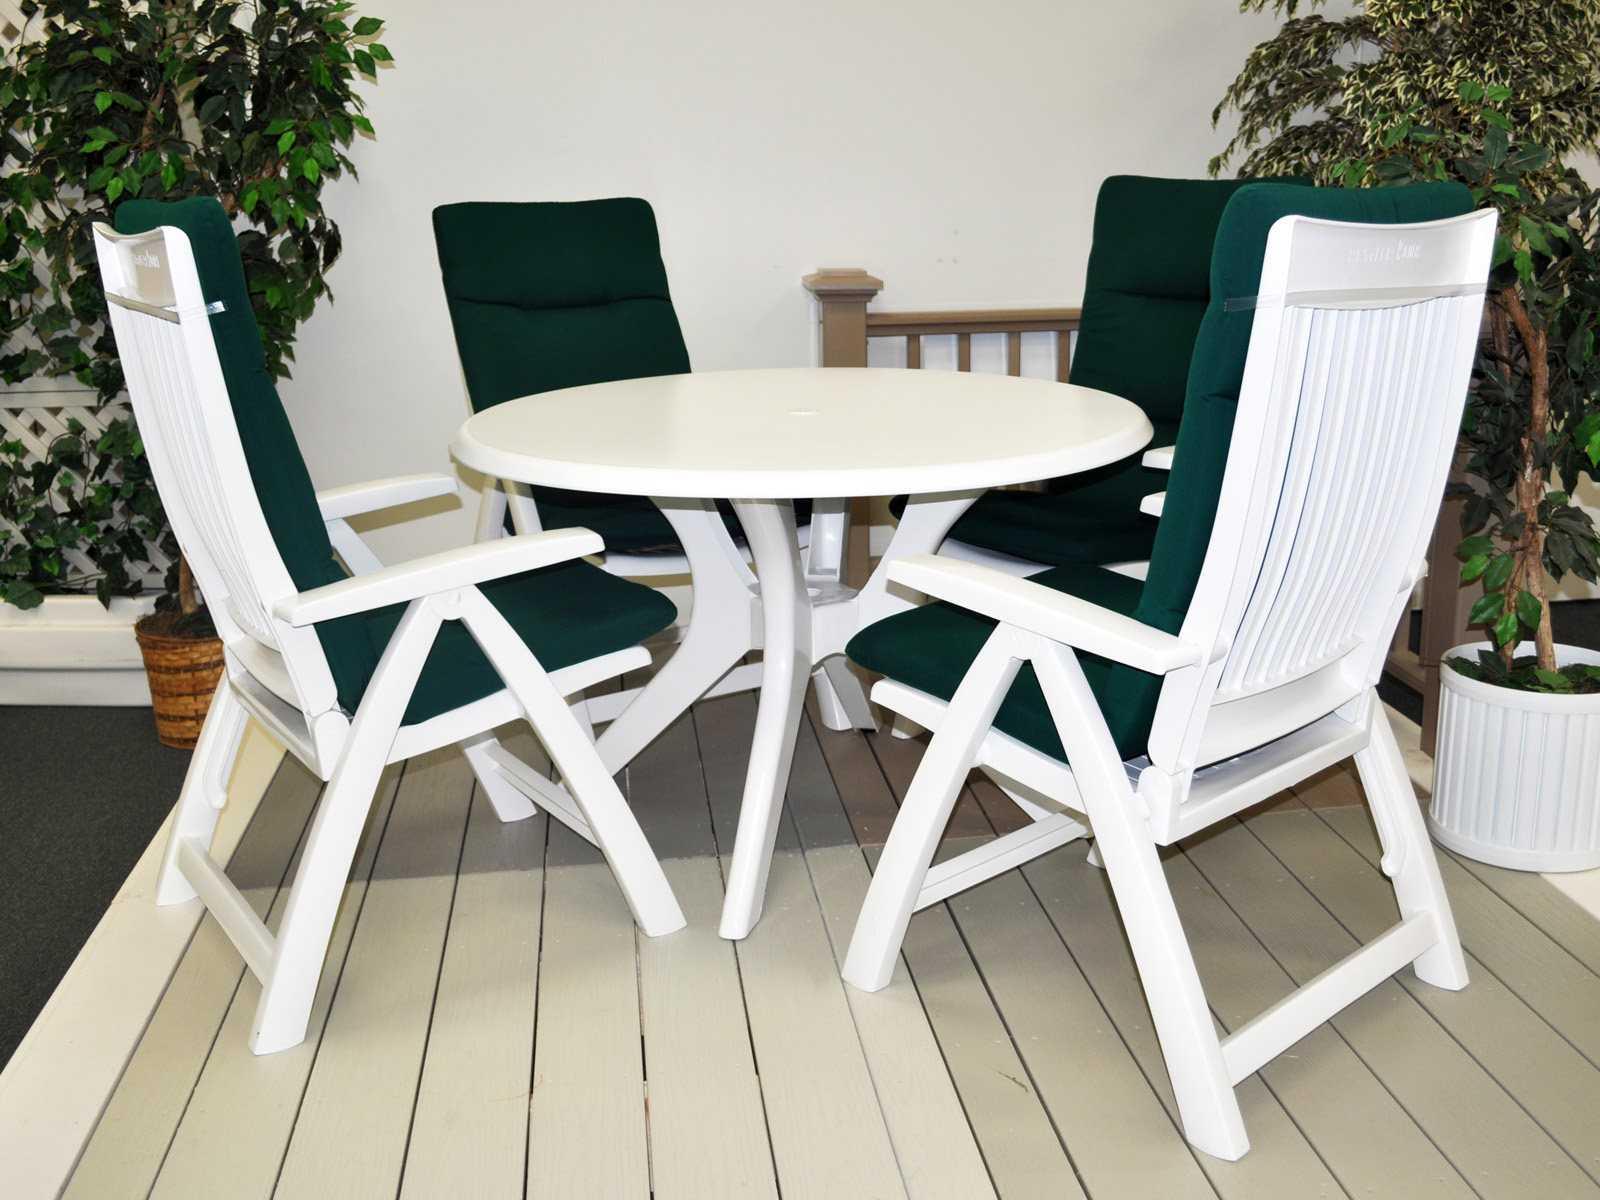 Kettler Roma MultiPosition Arm Chair  1438000